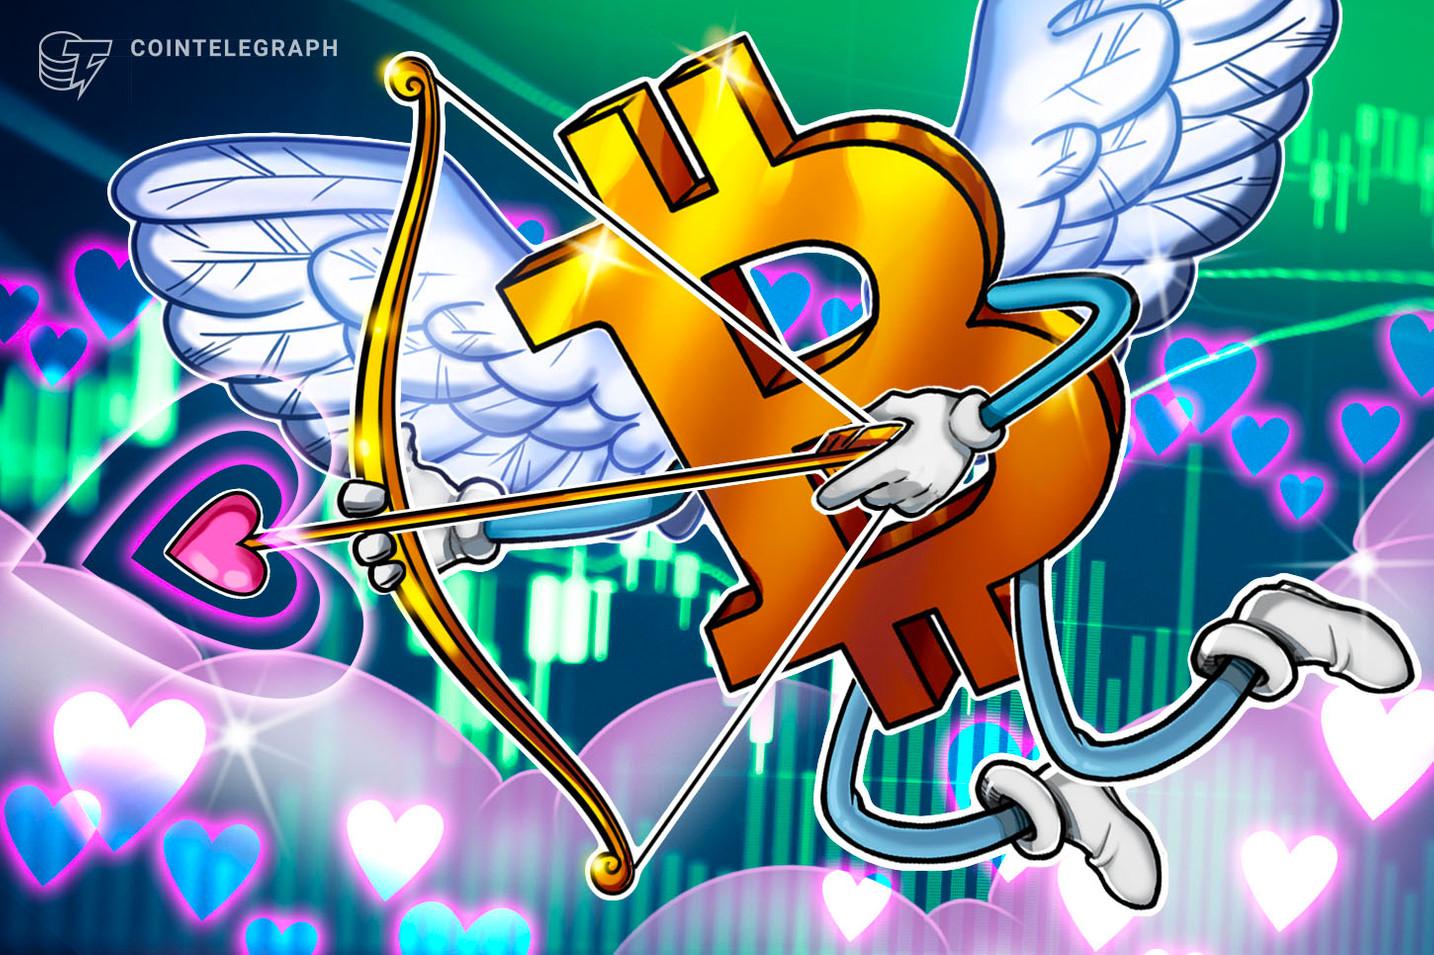 'Tidak apa-apa' untuk membeli Bitcoin sebagai pengganti emas, kata mantan Menteri Keuangan Trump Mnuchin